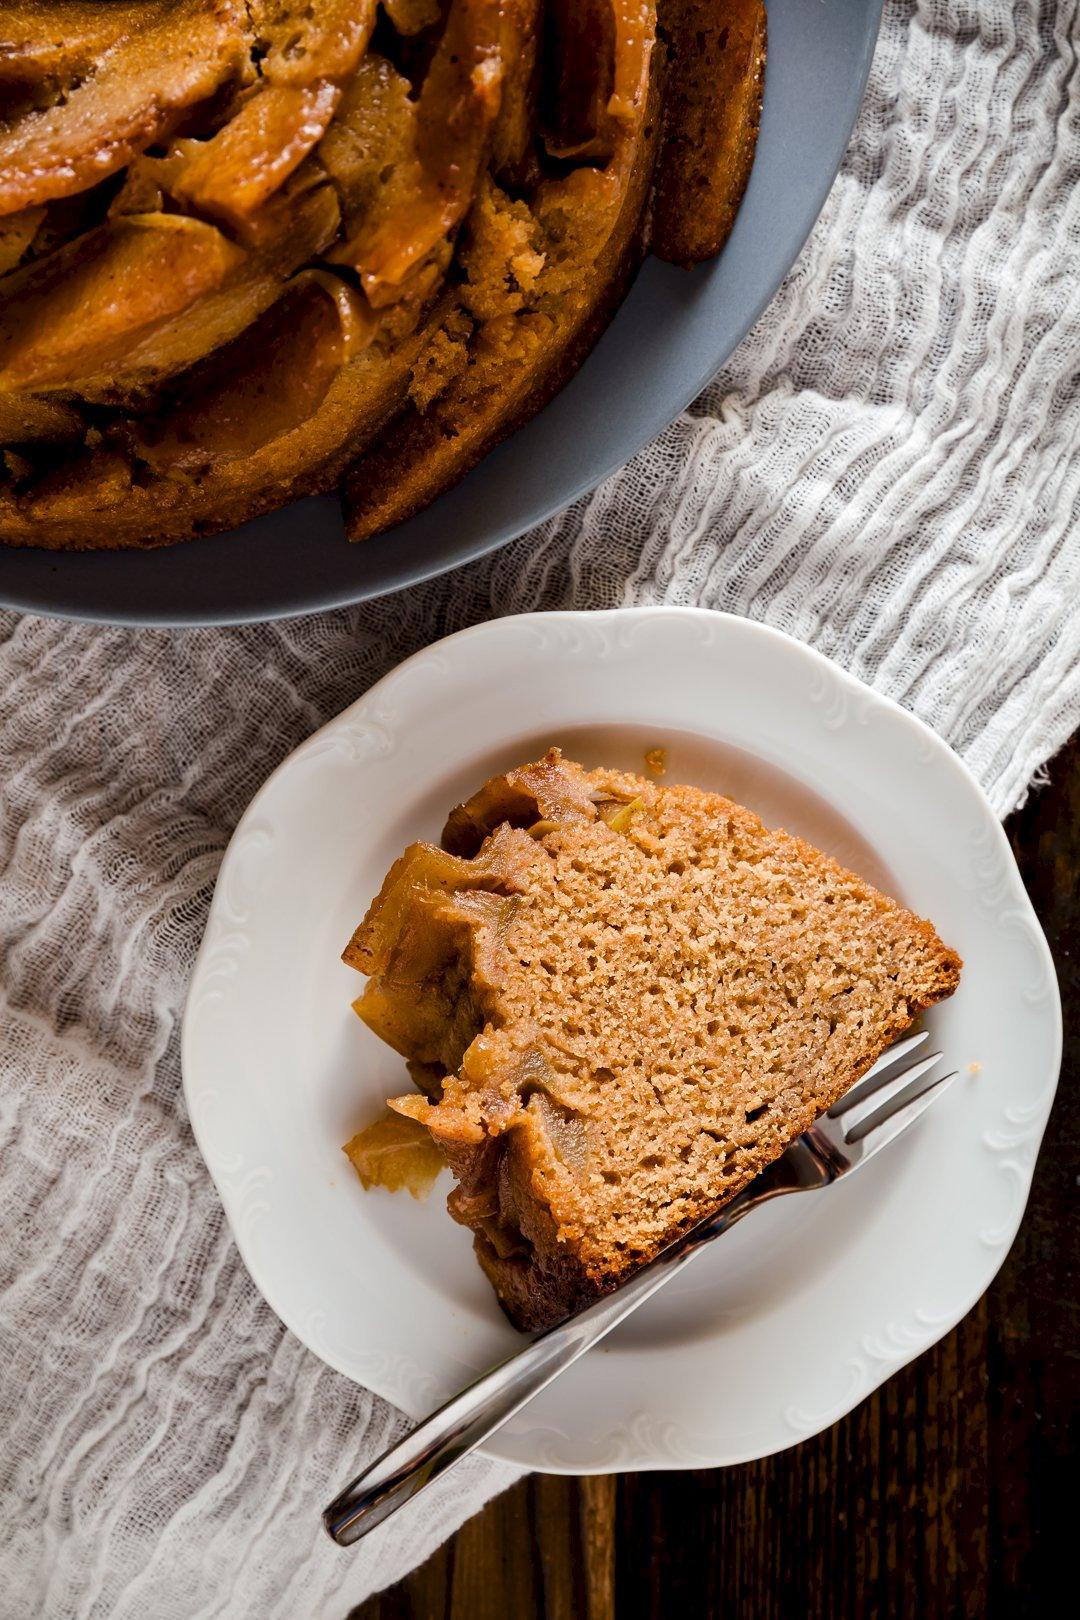 Apple and Honey Bundt Cake